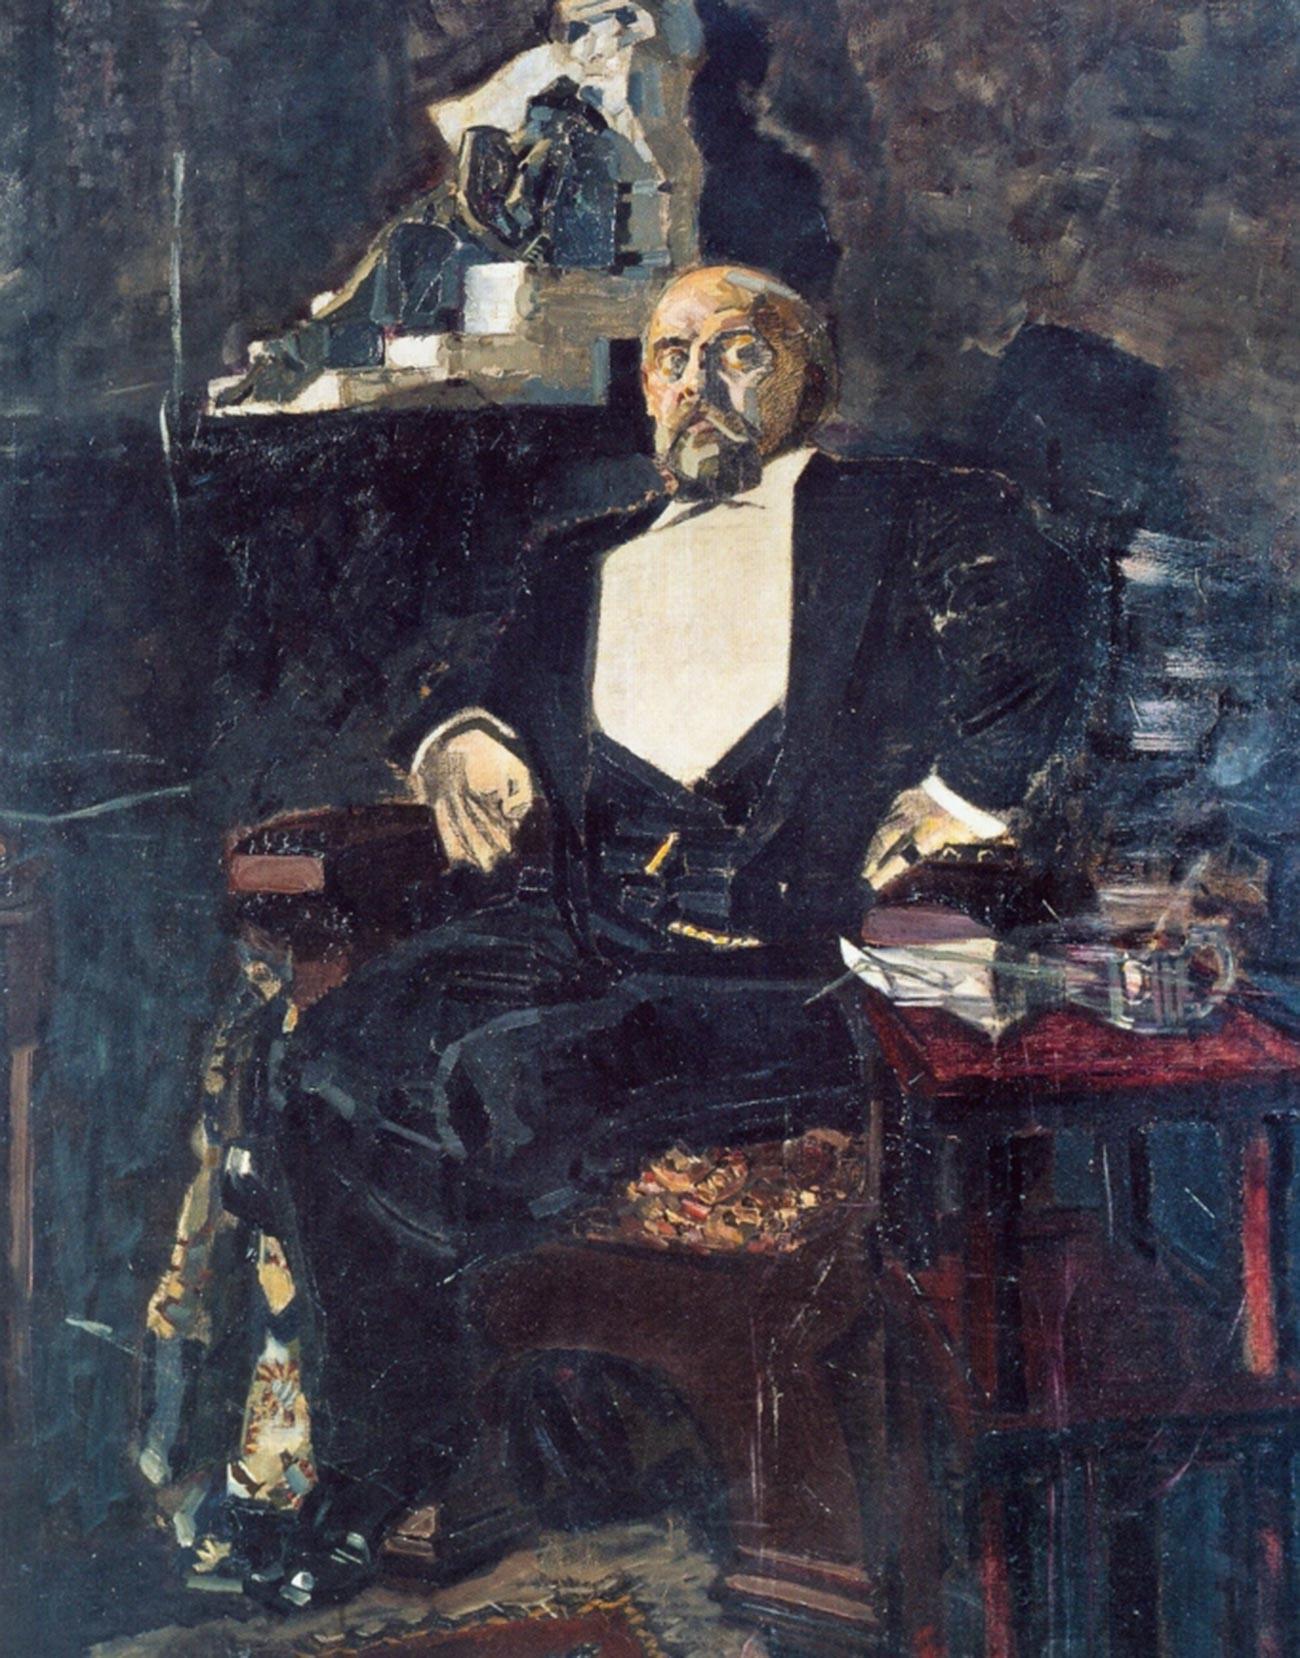 Mikhail Vrubel,